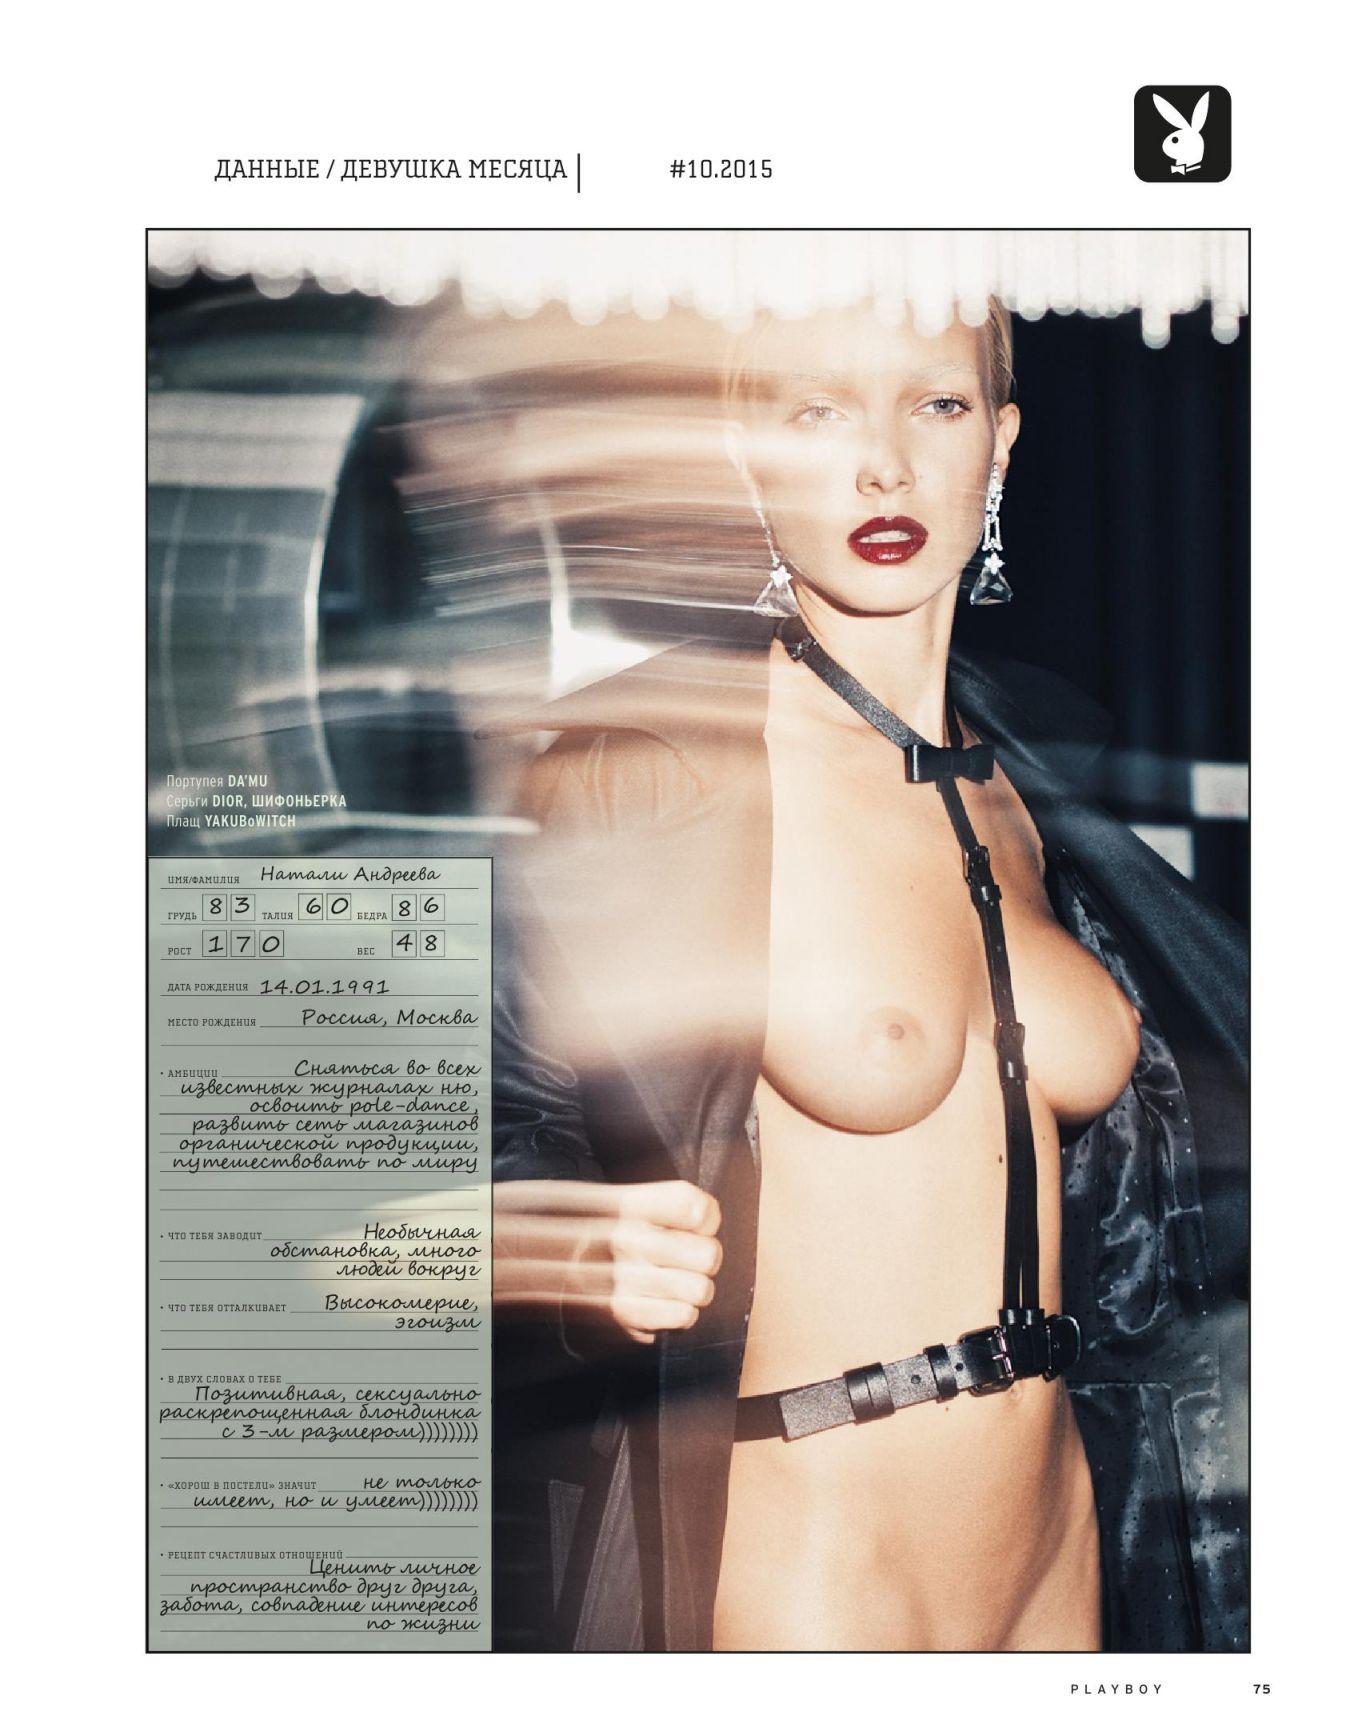 Natalie Andreeva nude photos  (2)